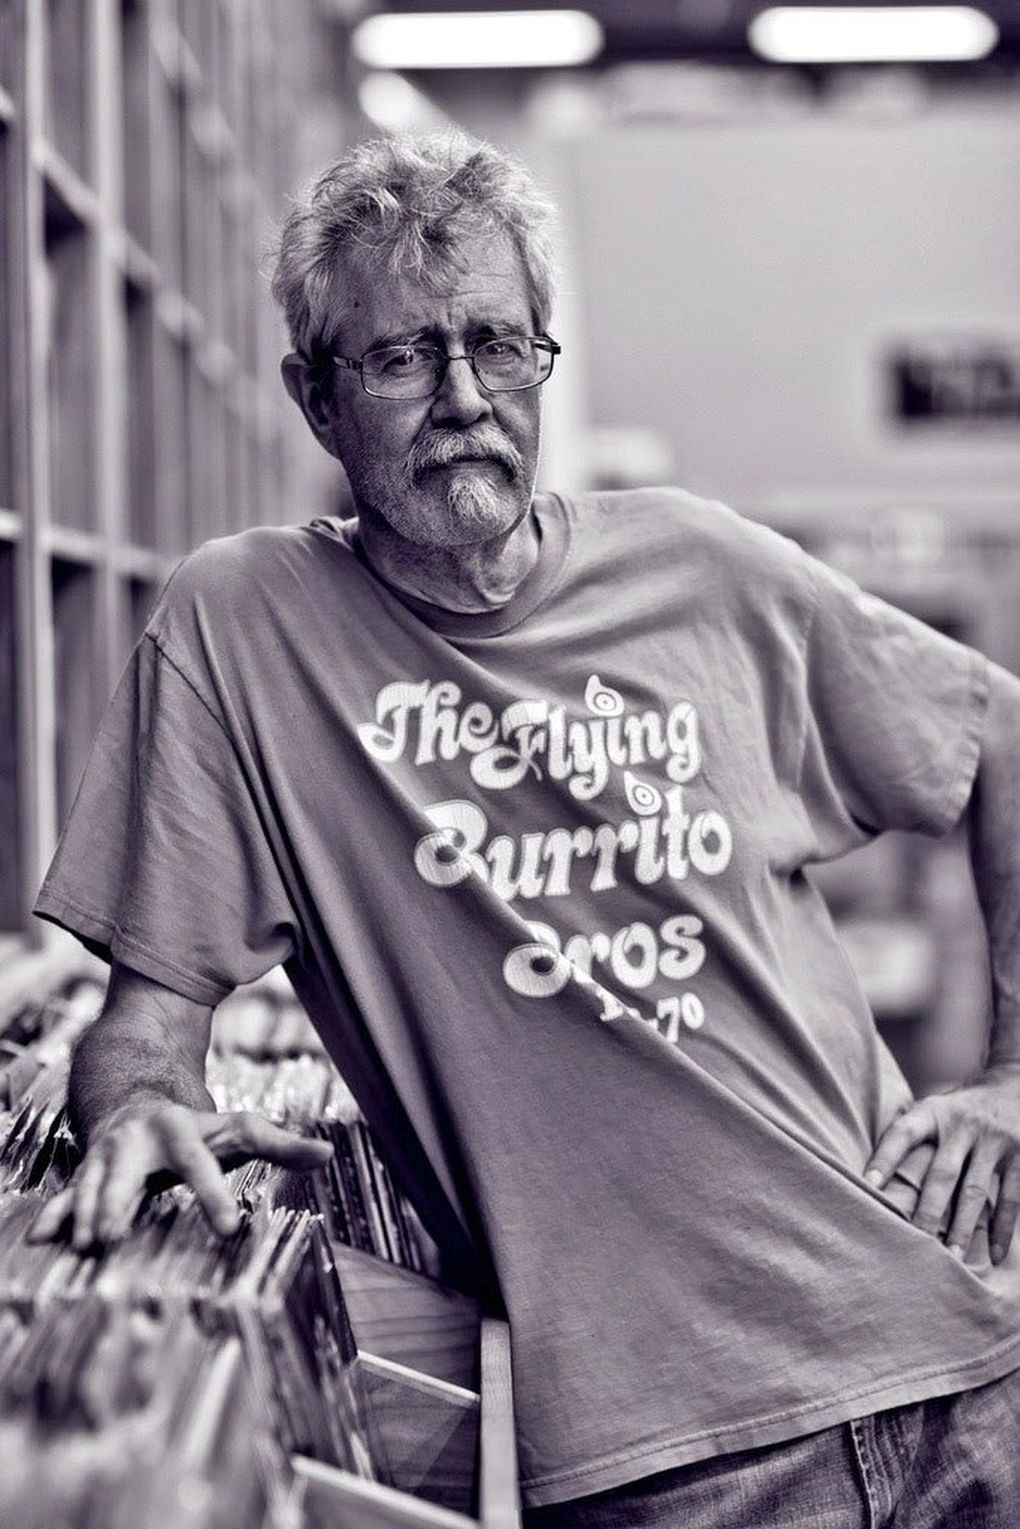 Dave Voorhees, owner of Bop Street Records in Ballard. (Courtesy of Dave Voorhees)